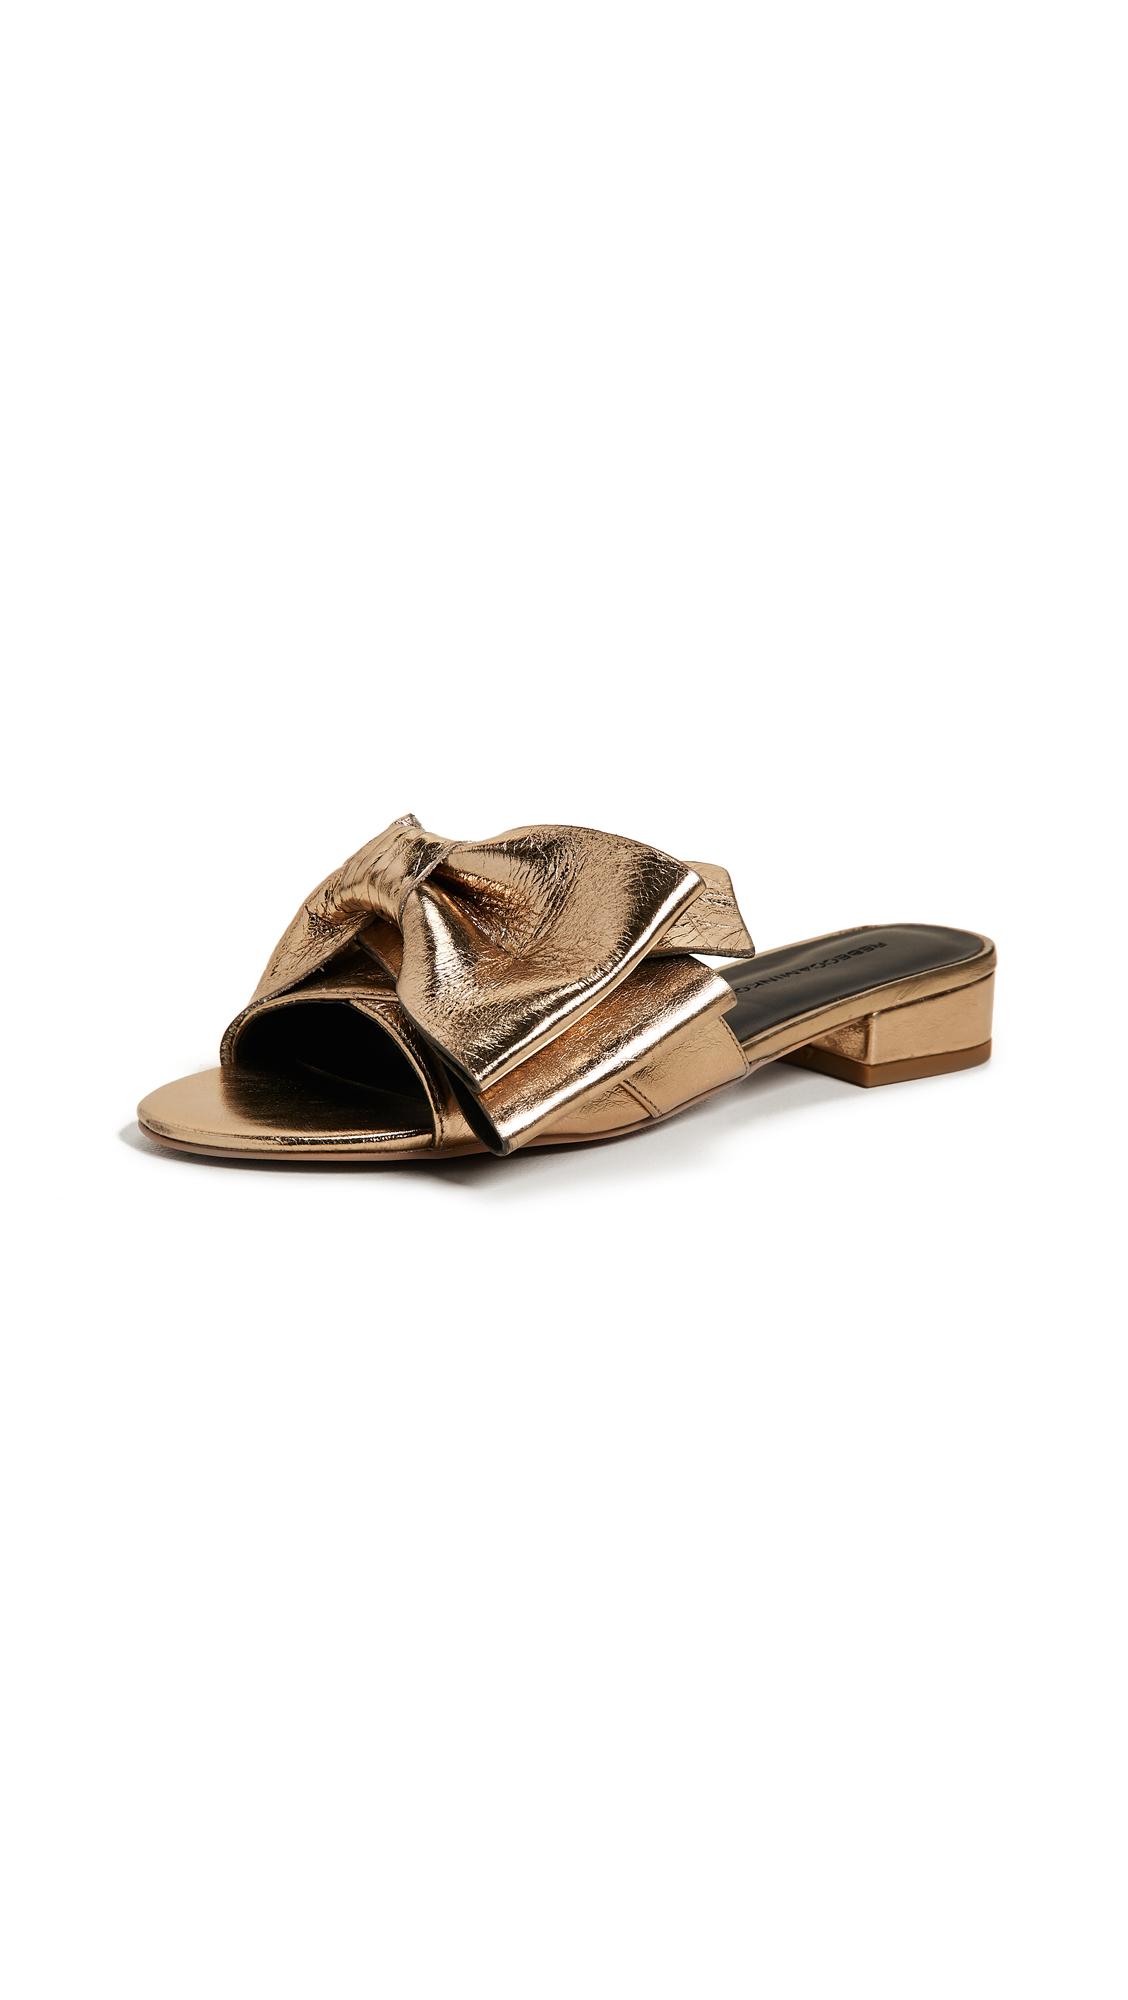 Rebecca Minkoff Calista Slides - Gold